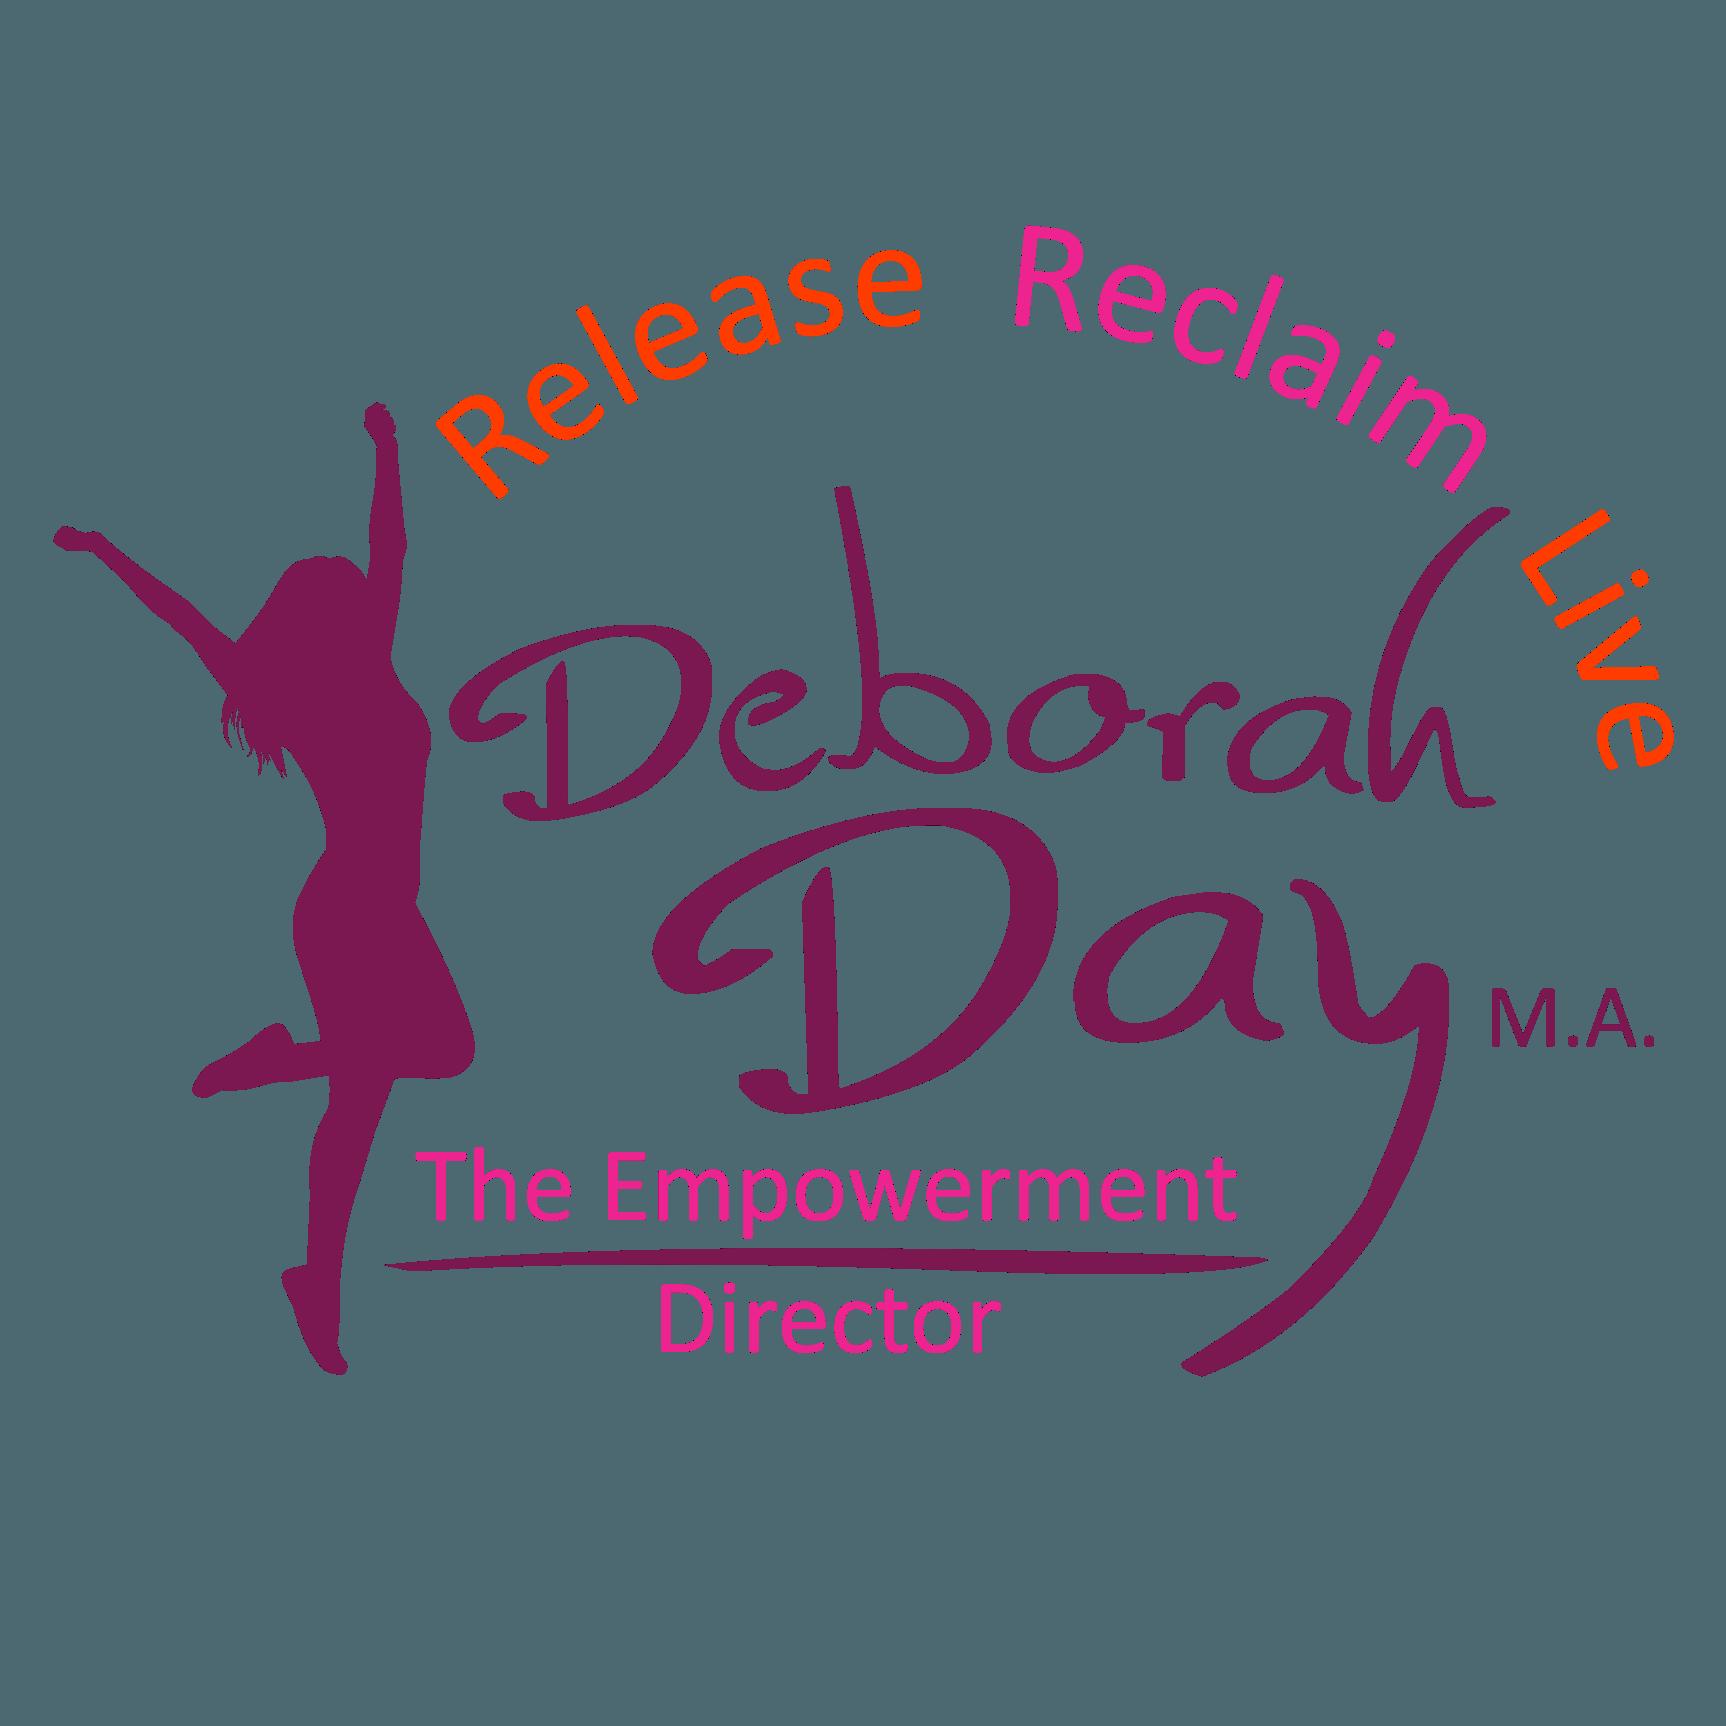 Deborah Day, M.A.